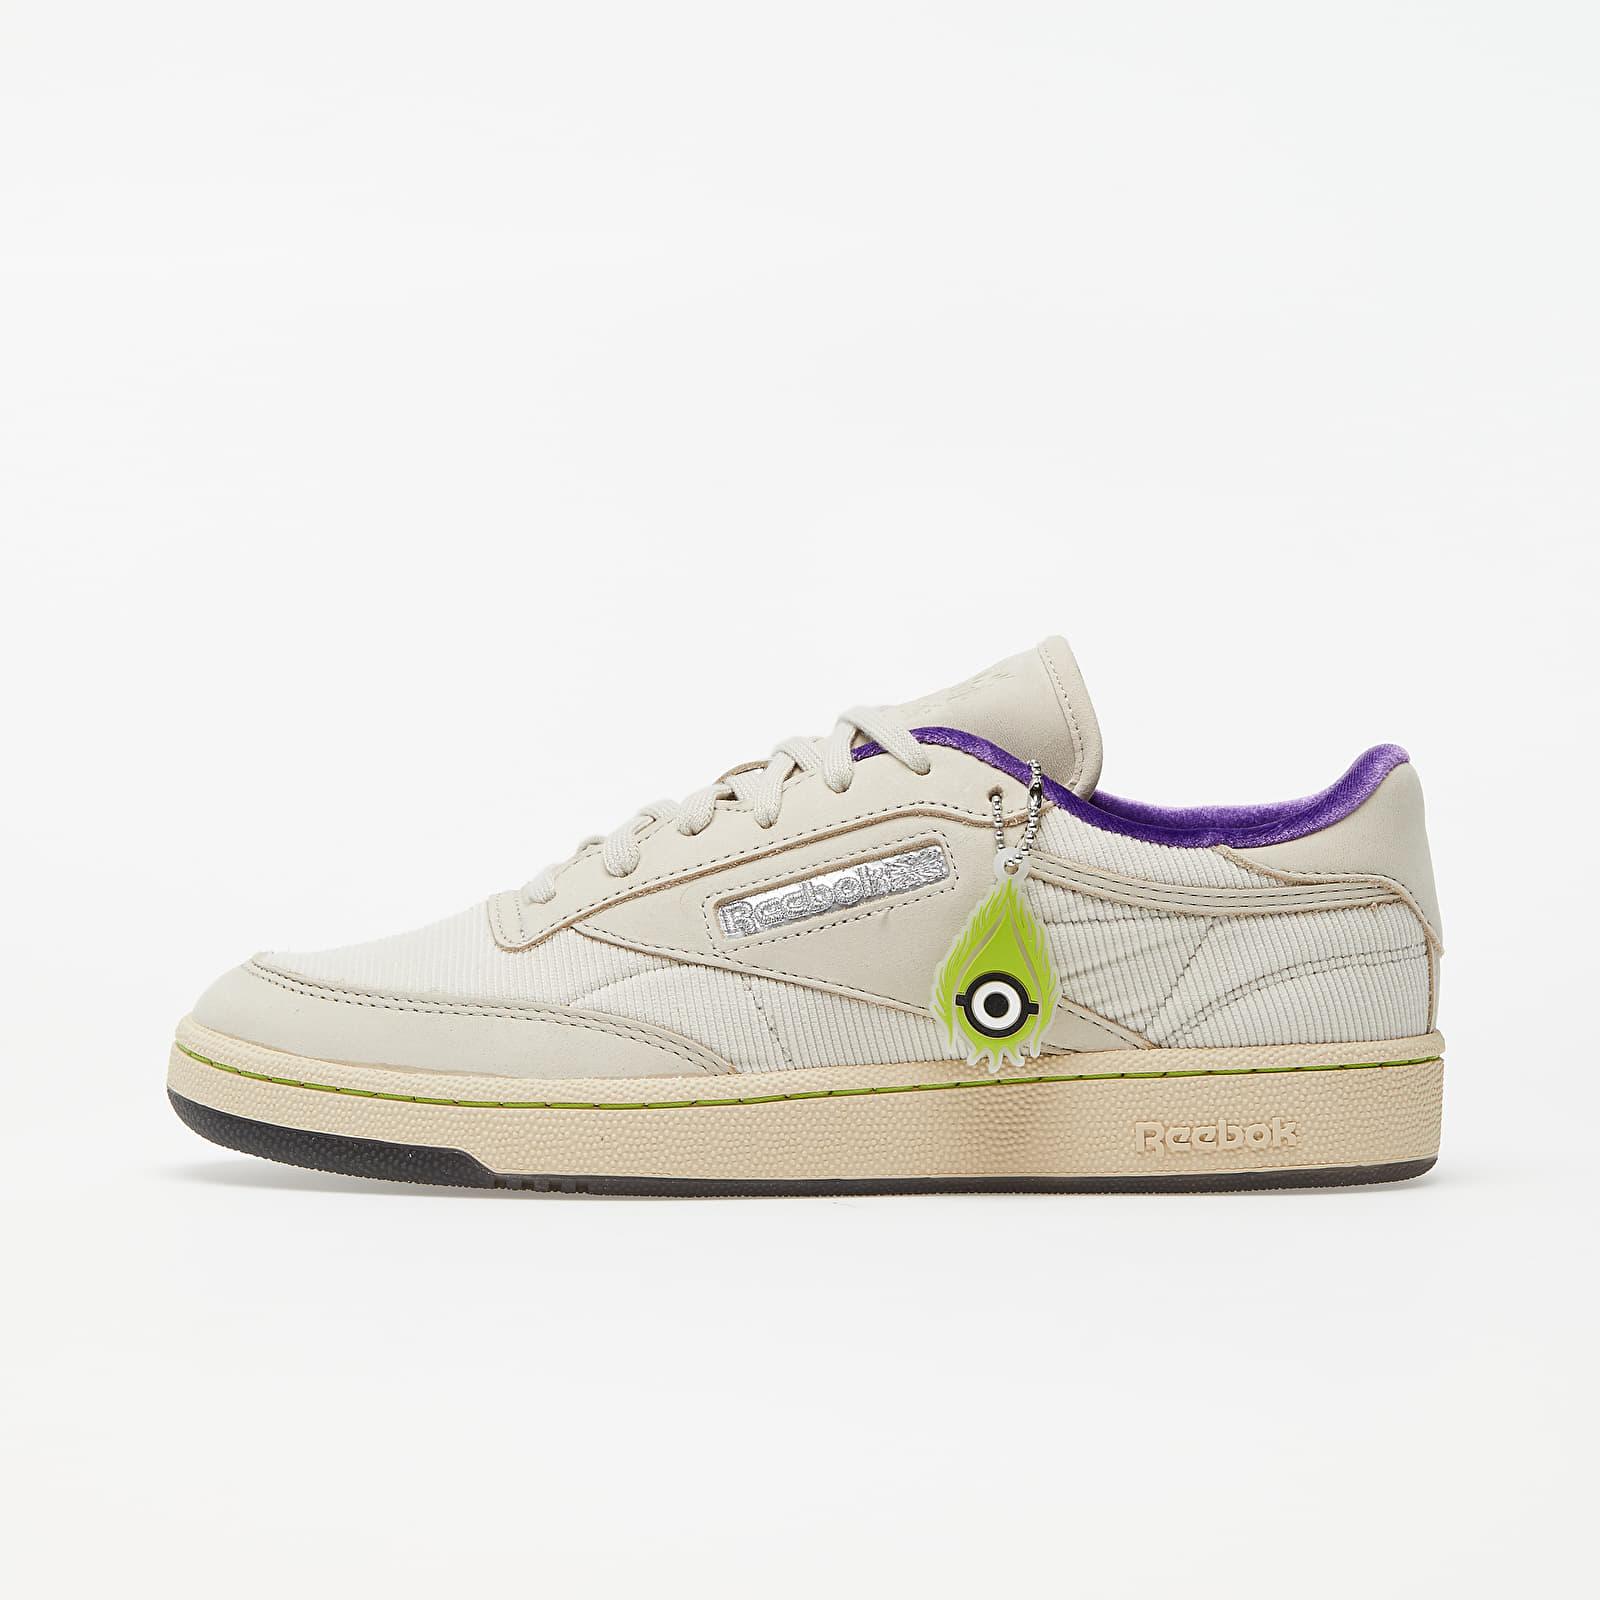 Pánske tenisky a topánky Reebok x Minions Club C 85 Mu Stucco/ Stucco/ Reebok Lee 6